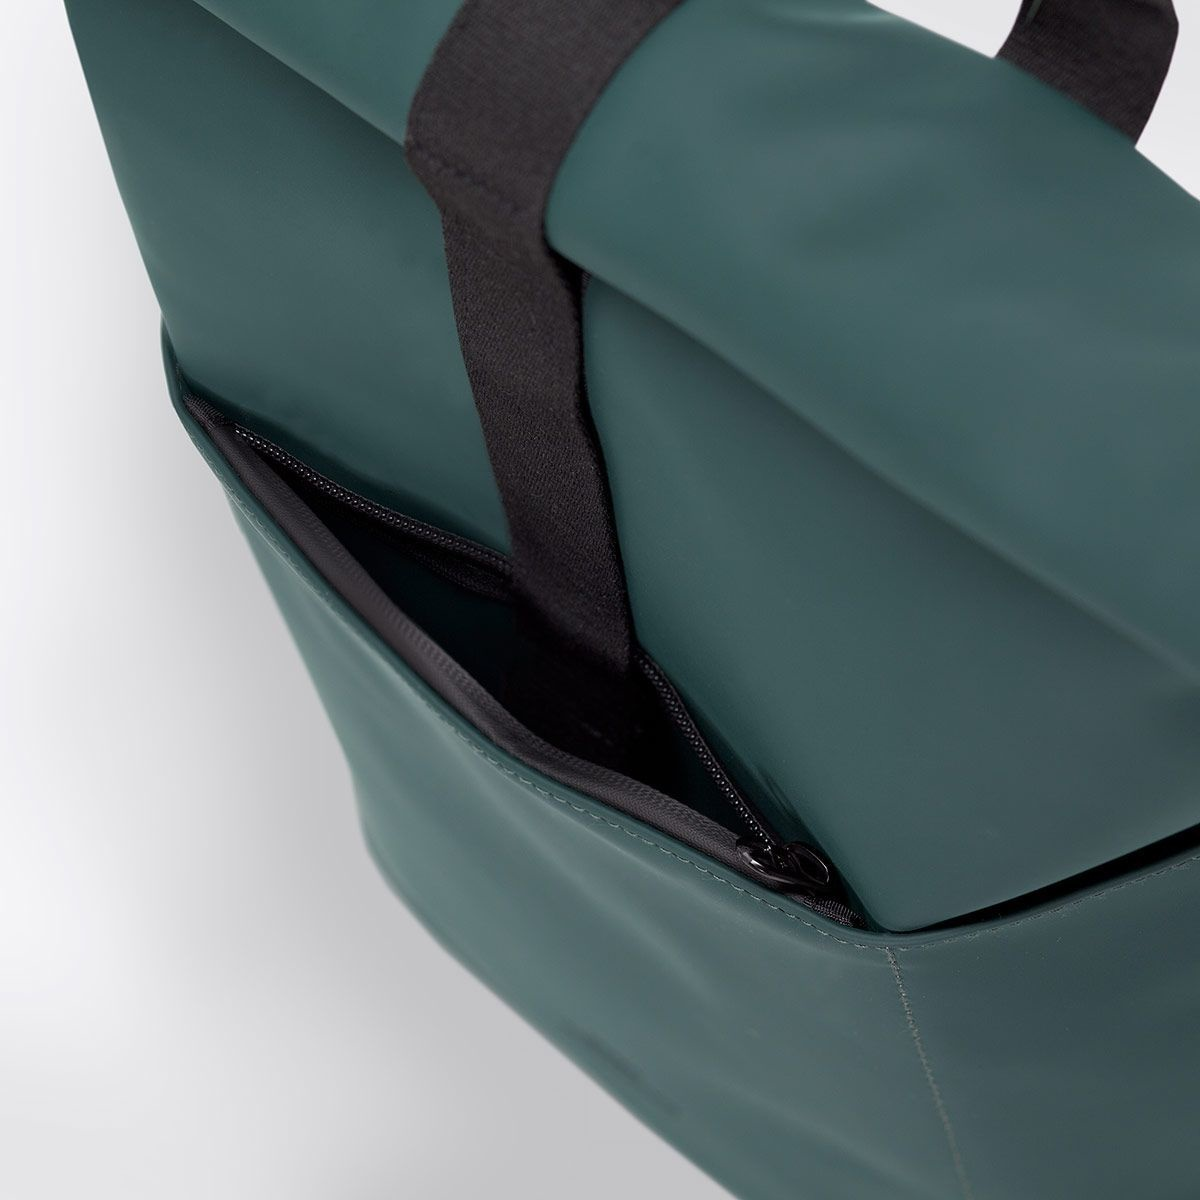 Ucon Acrobatics Ucon Acrobatics Hajo Mini Backpack - Lotus Series - Forest